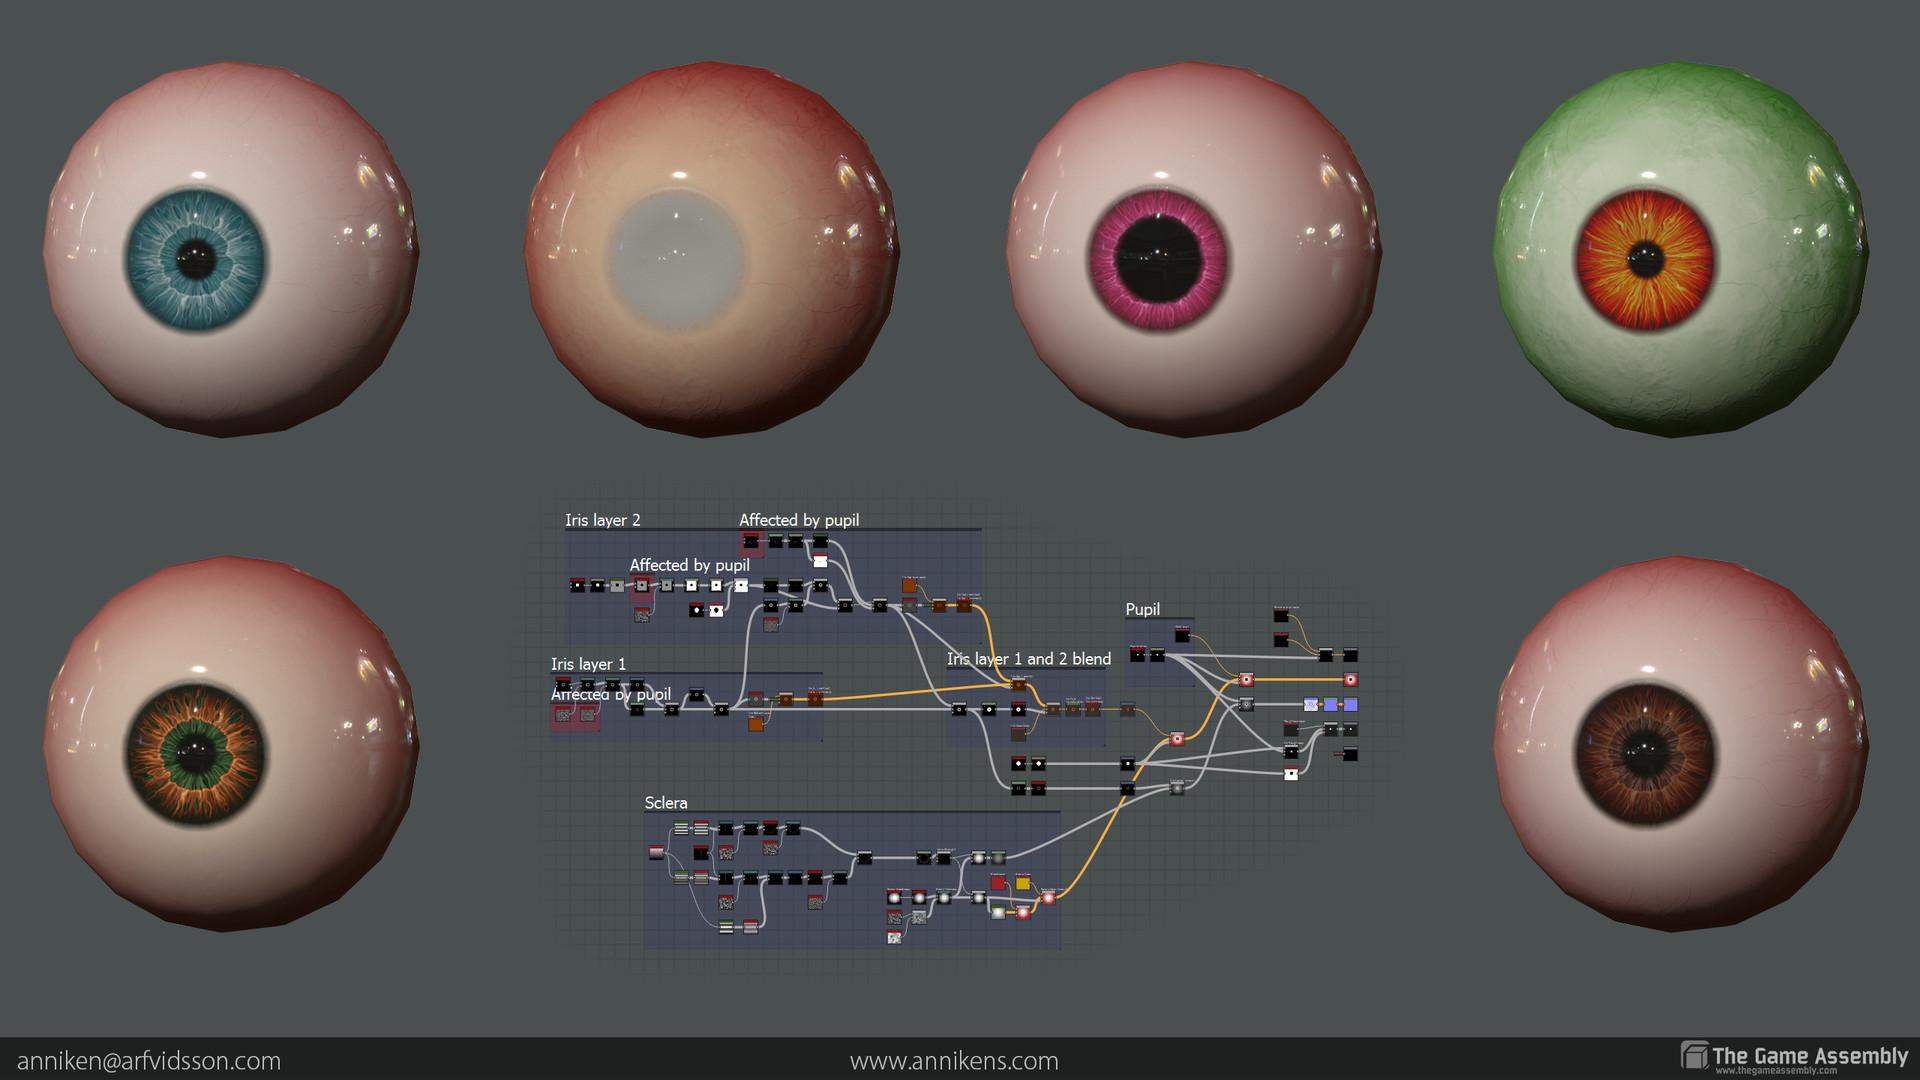 Anniken arfvidsson eye